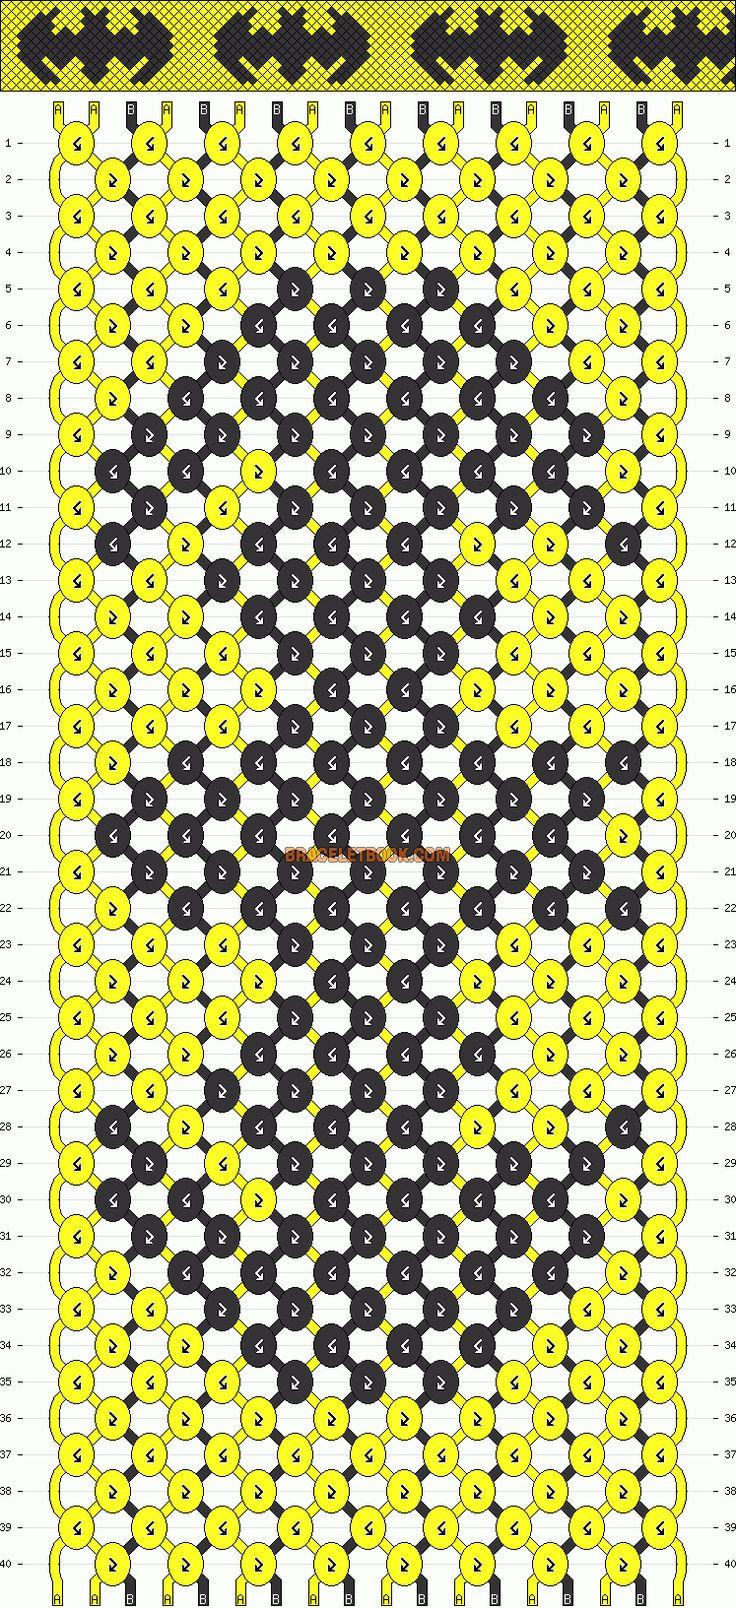 Normal Friendship Bracelet Pattern #1008 - BraceletBook.com